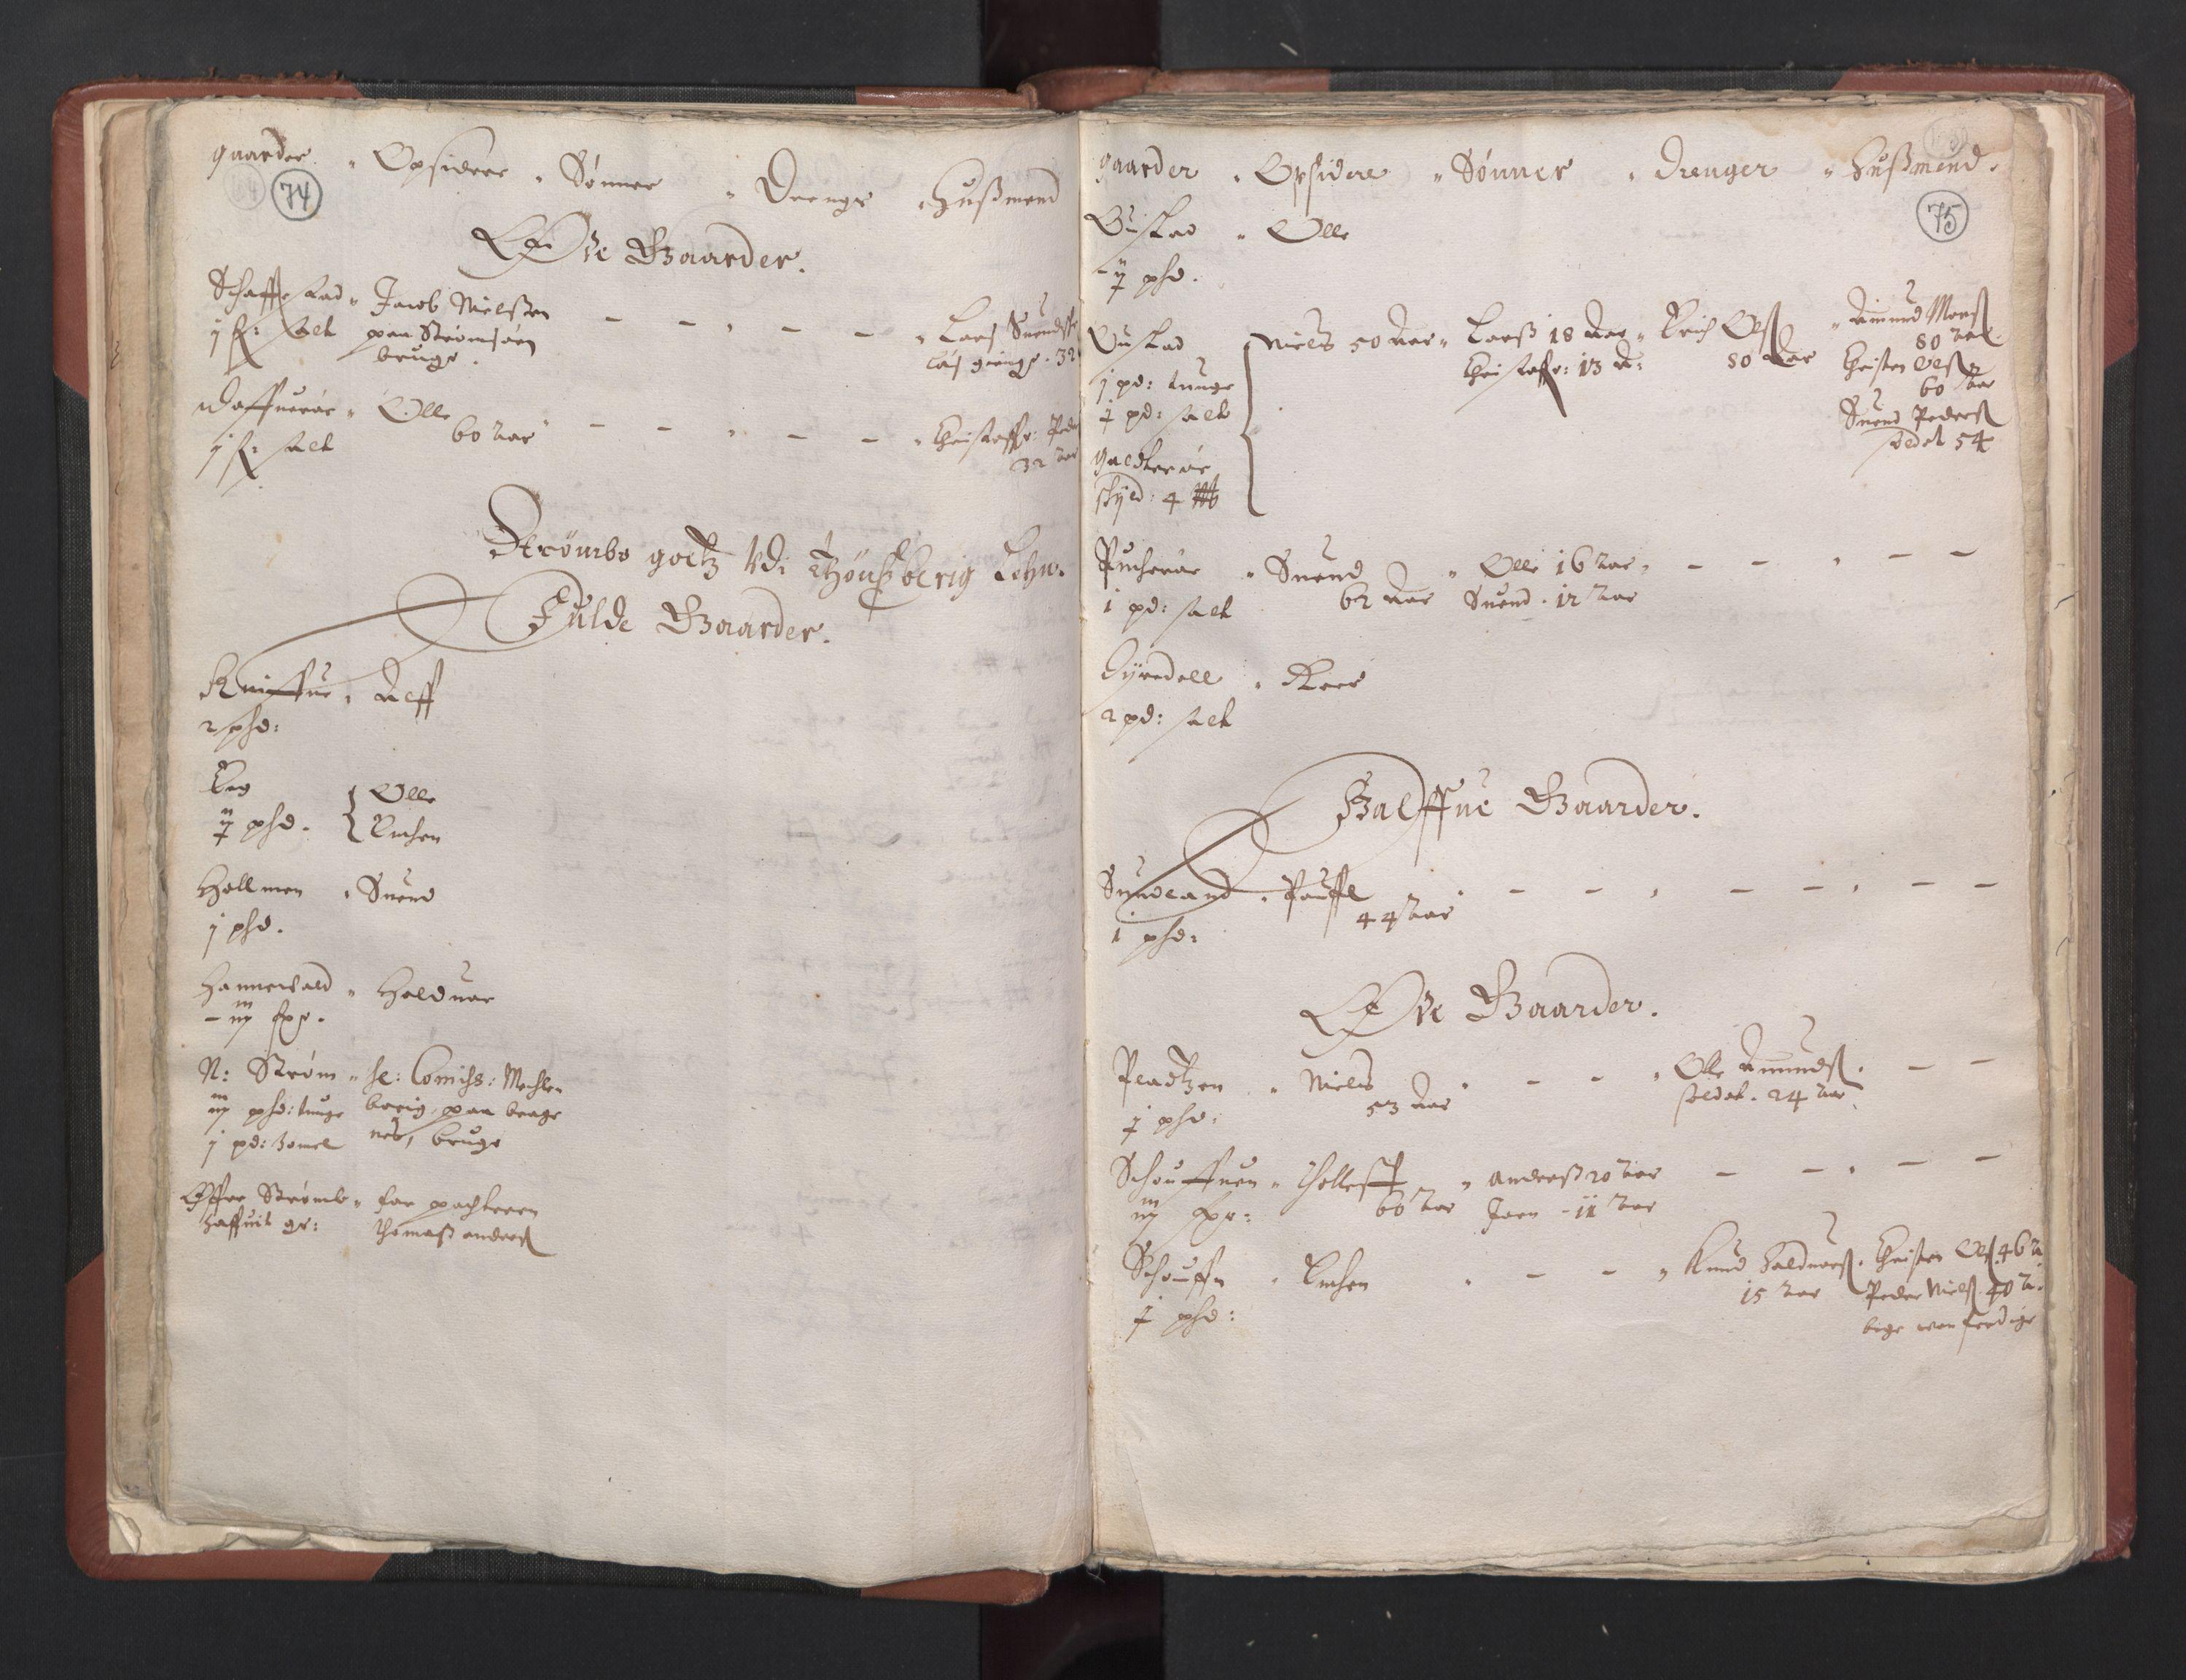 RA, Fogdenes og sorenskrivernes manntall 1664-1666, nr. 5: Fogderier (len og skipreider) i nåværende Buskerud fylke og Vestfold fylke, 1664, s. 74-75